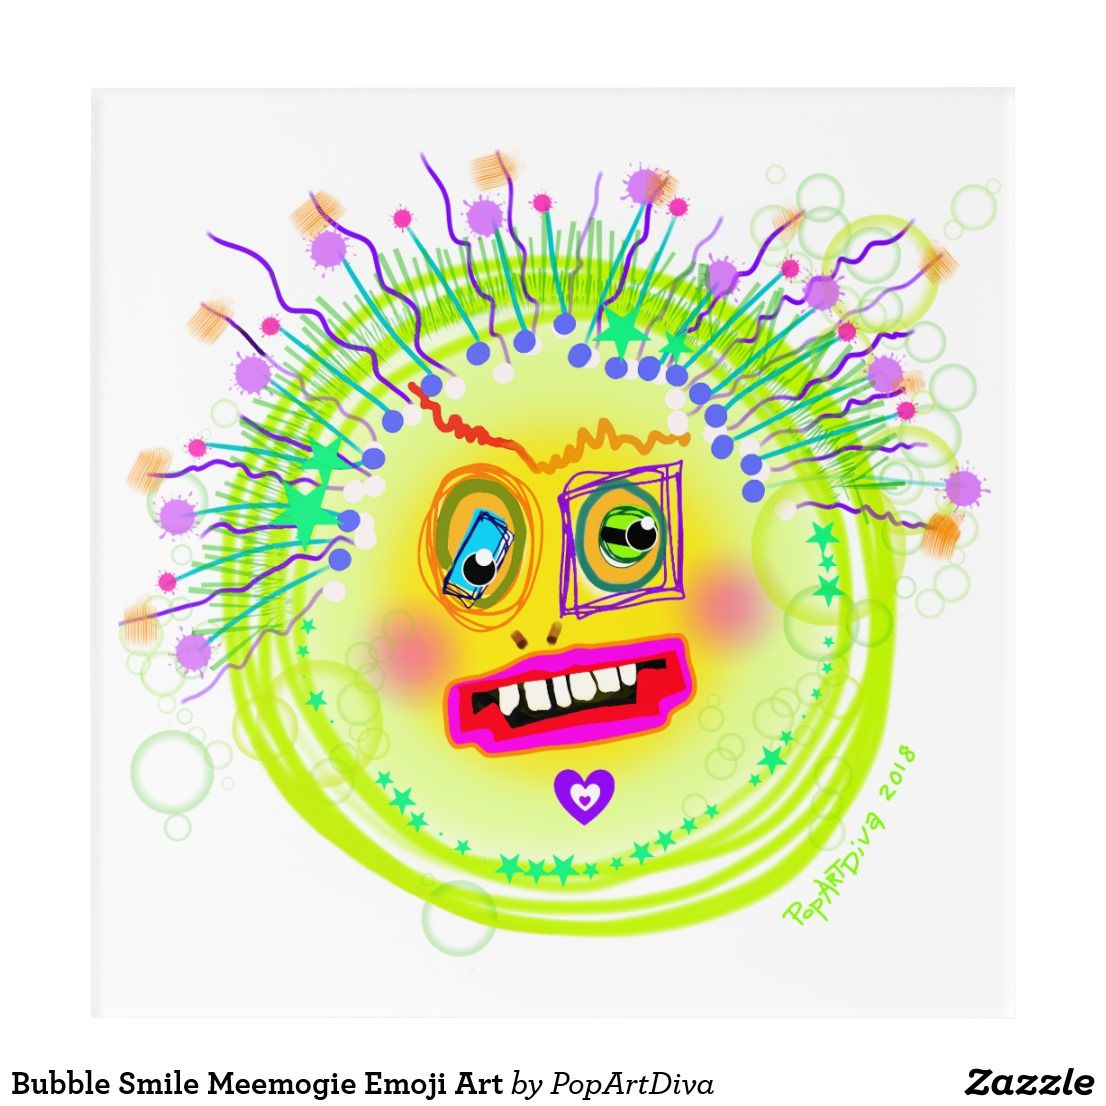 Bubble Smile Meemogie Emoji Art